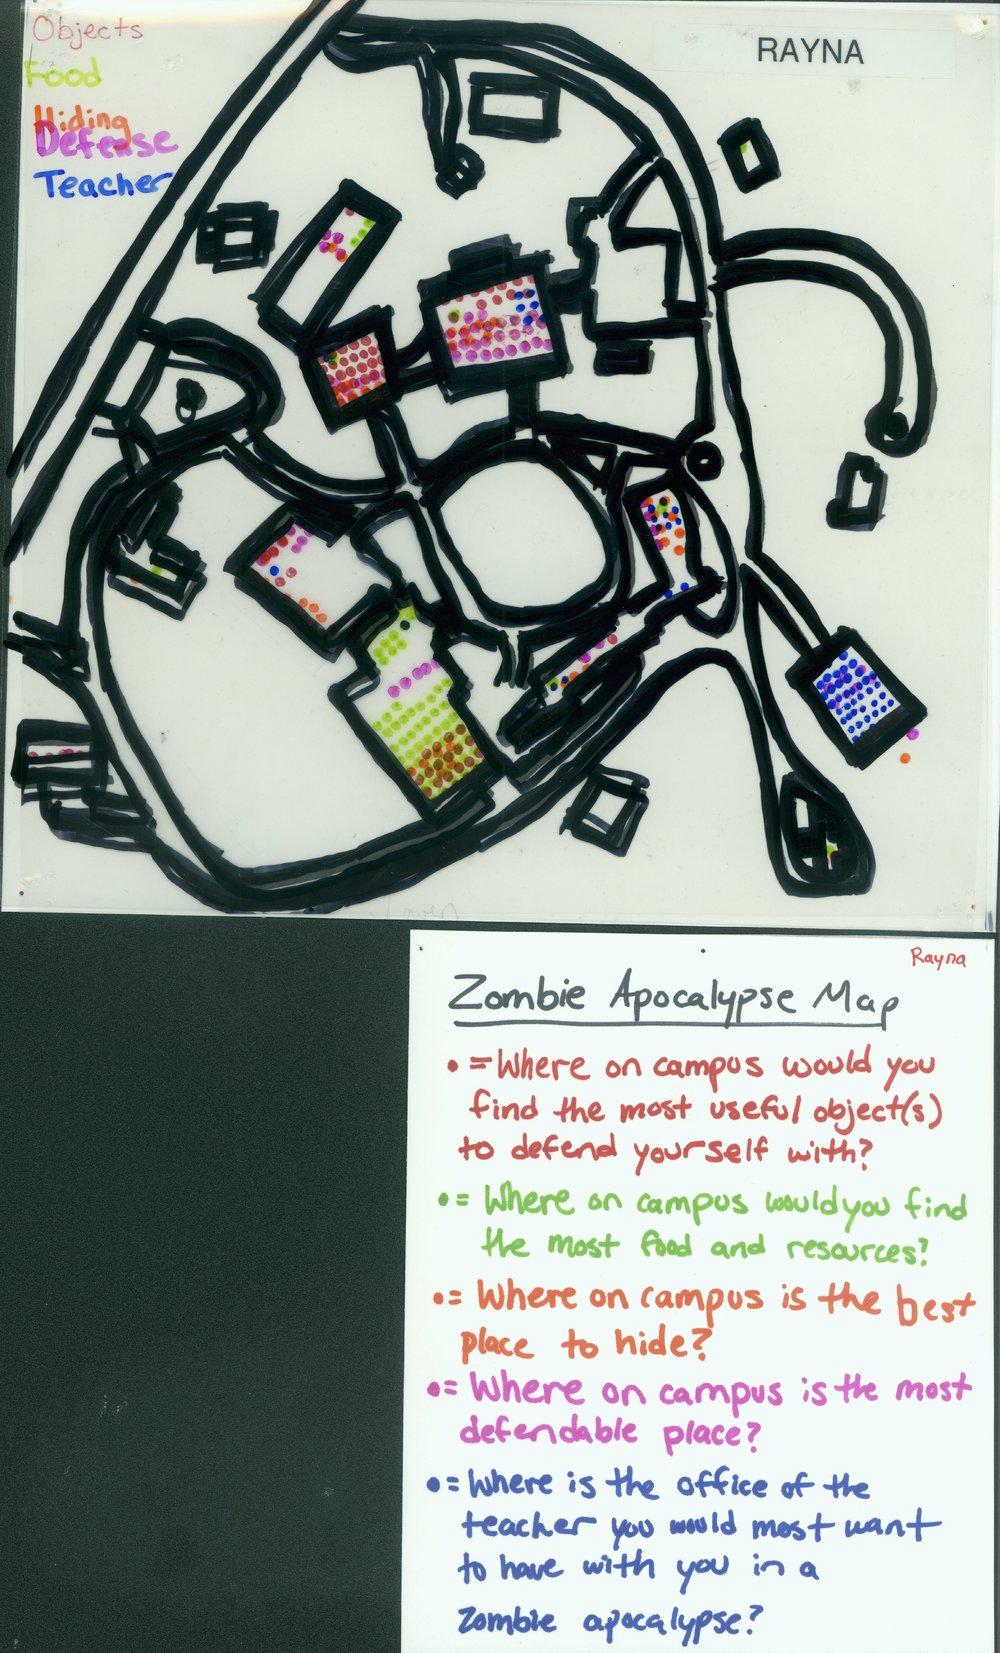 Rayna-Zombie map.jpg